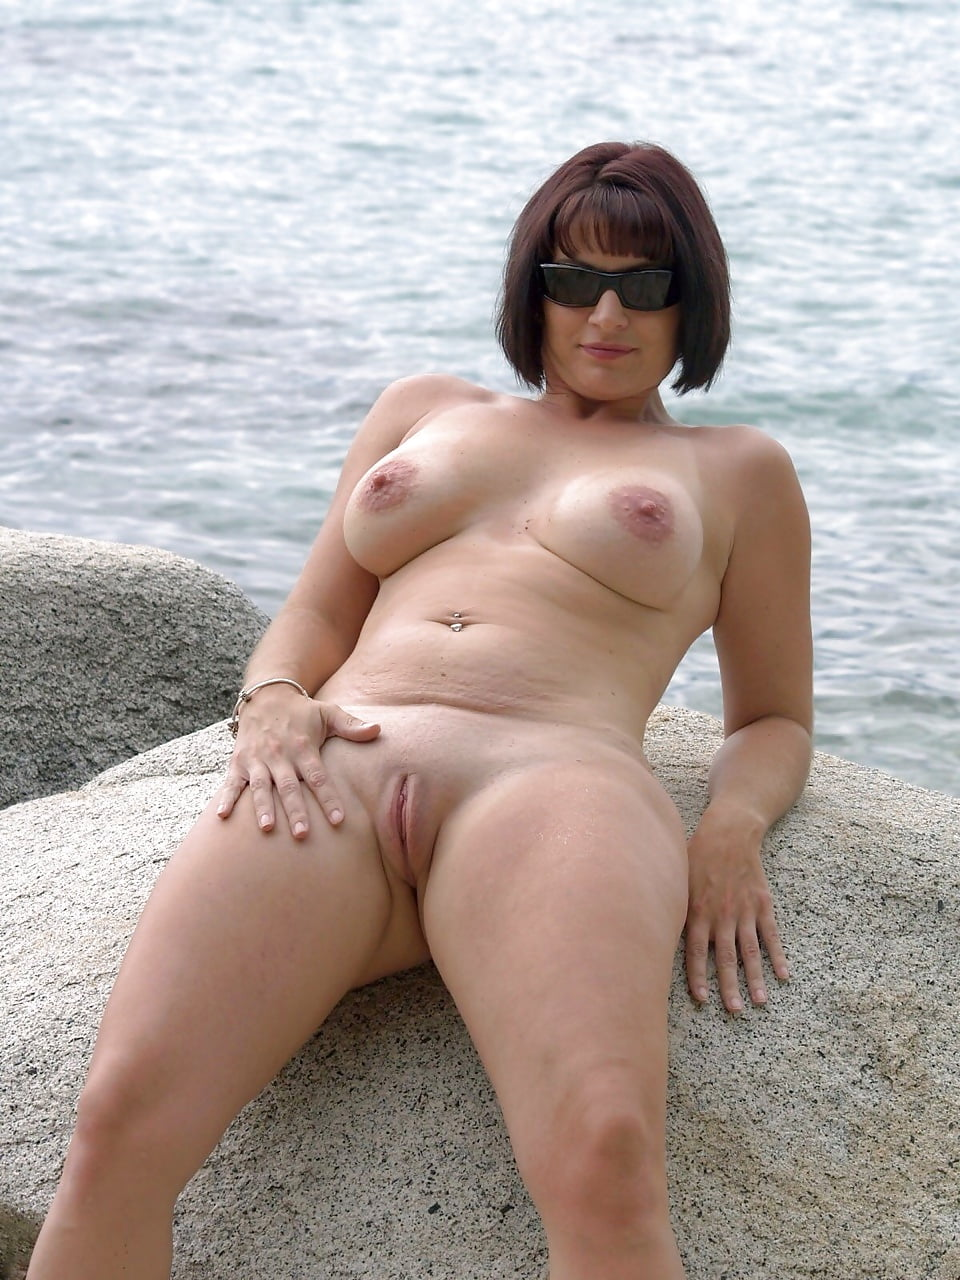 зрелая пизда на пляже